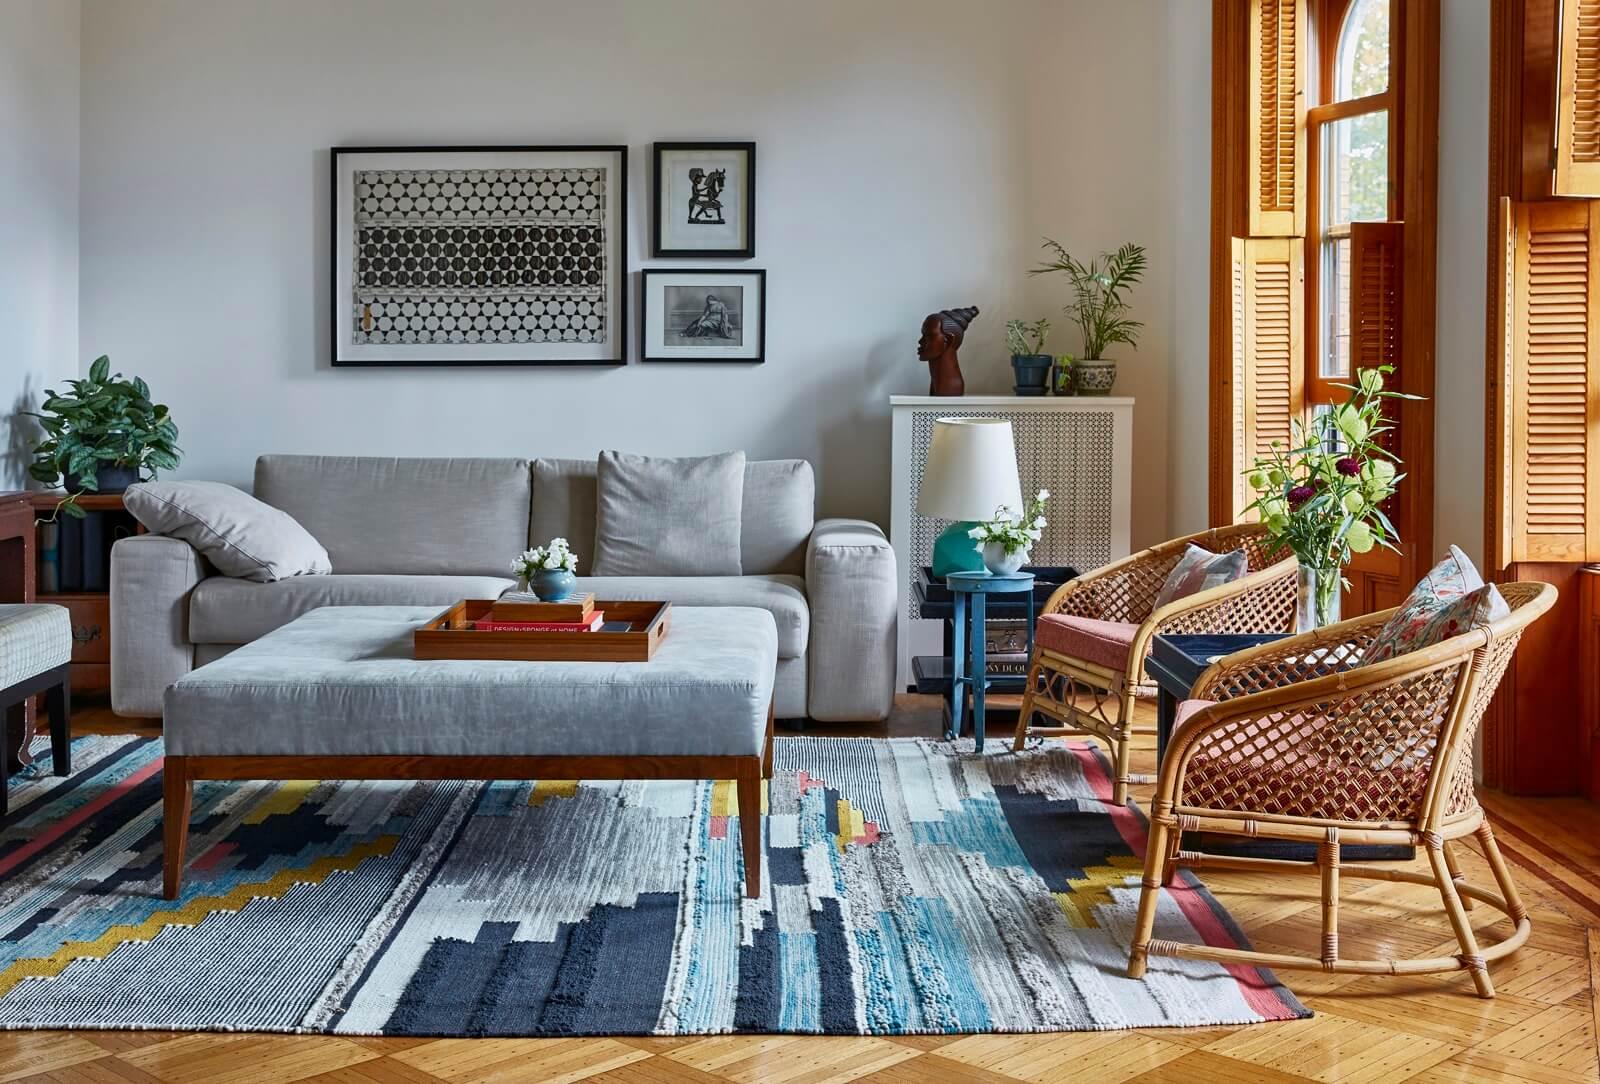 Interior Design Ideas New Life For A Vintage Park Slope Home